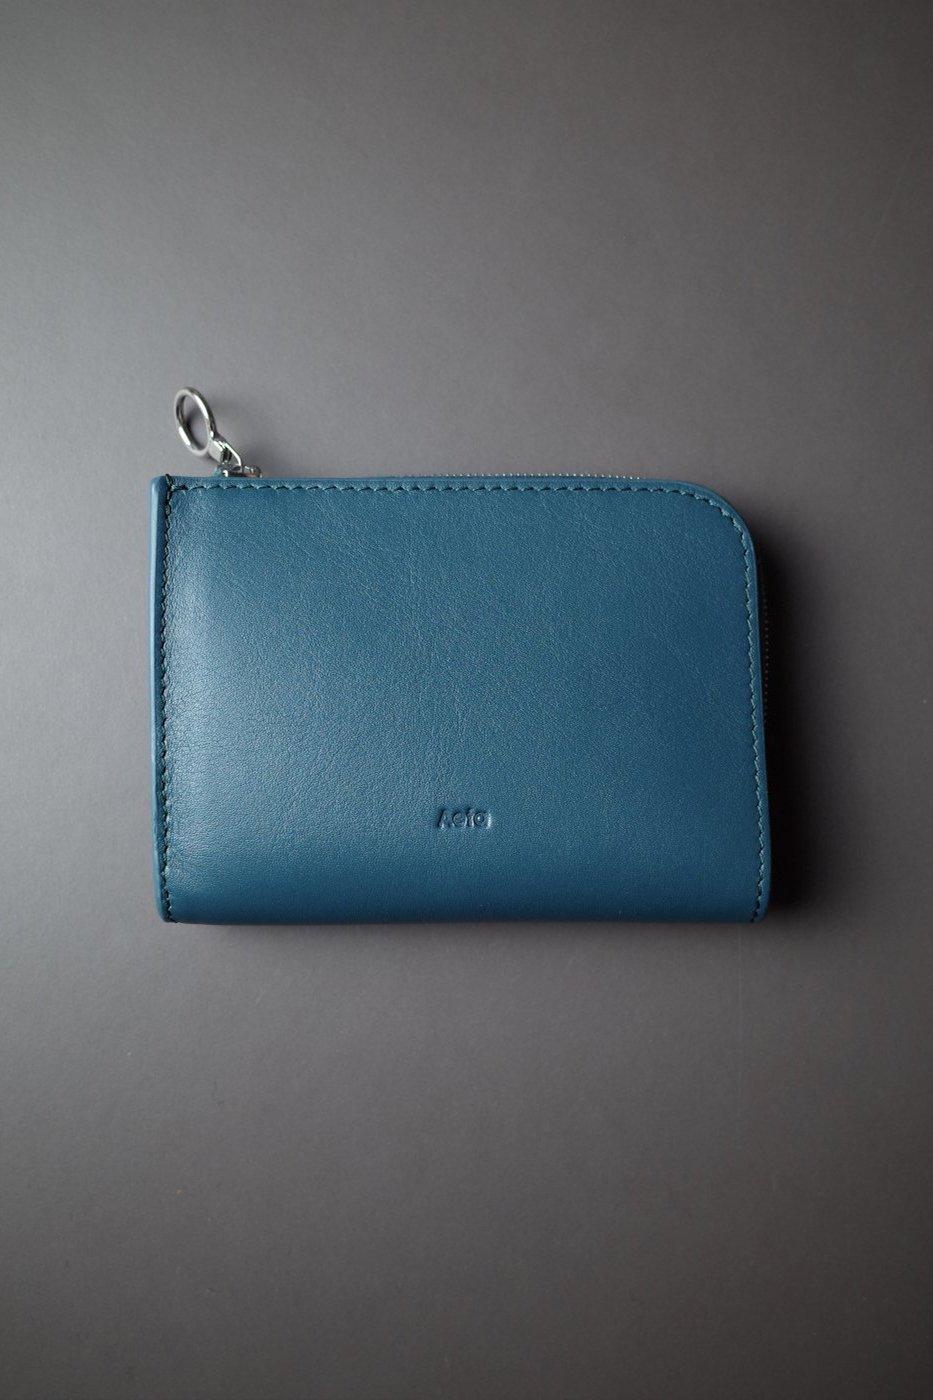 Aeta アエタ-FG16 WALLET typeB -BLUE GREEN